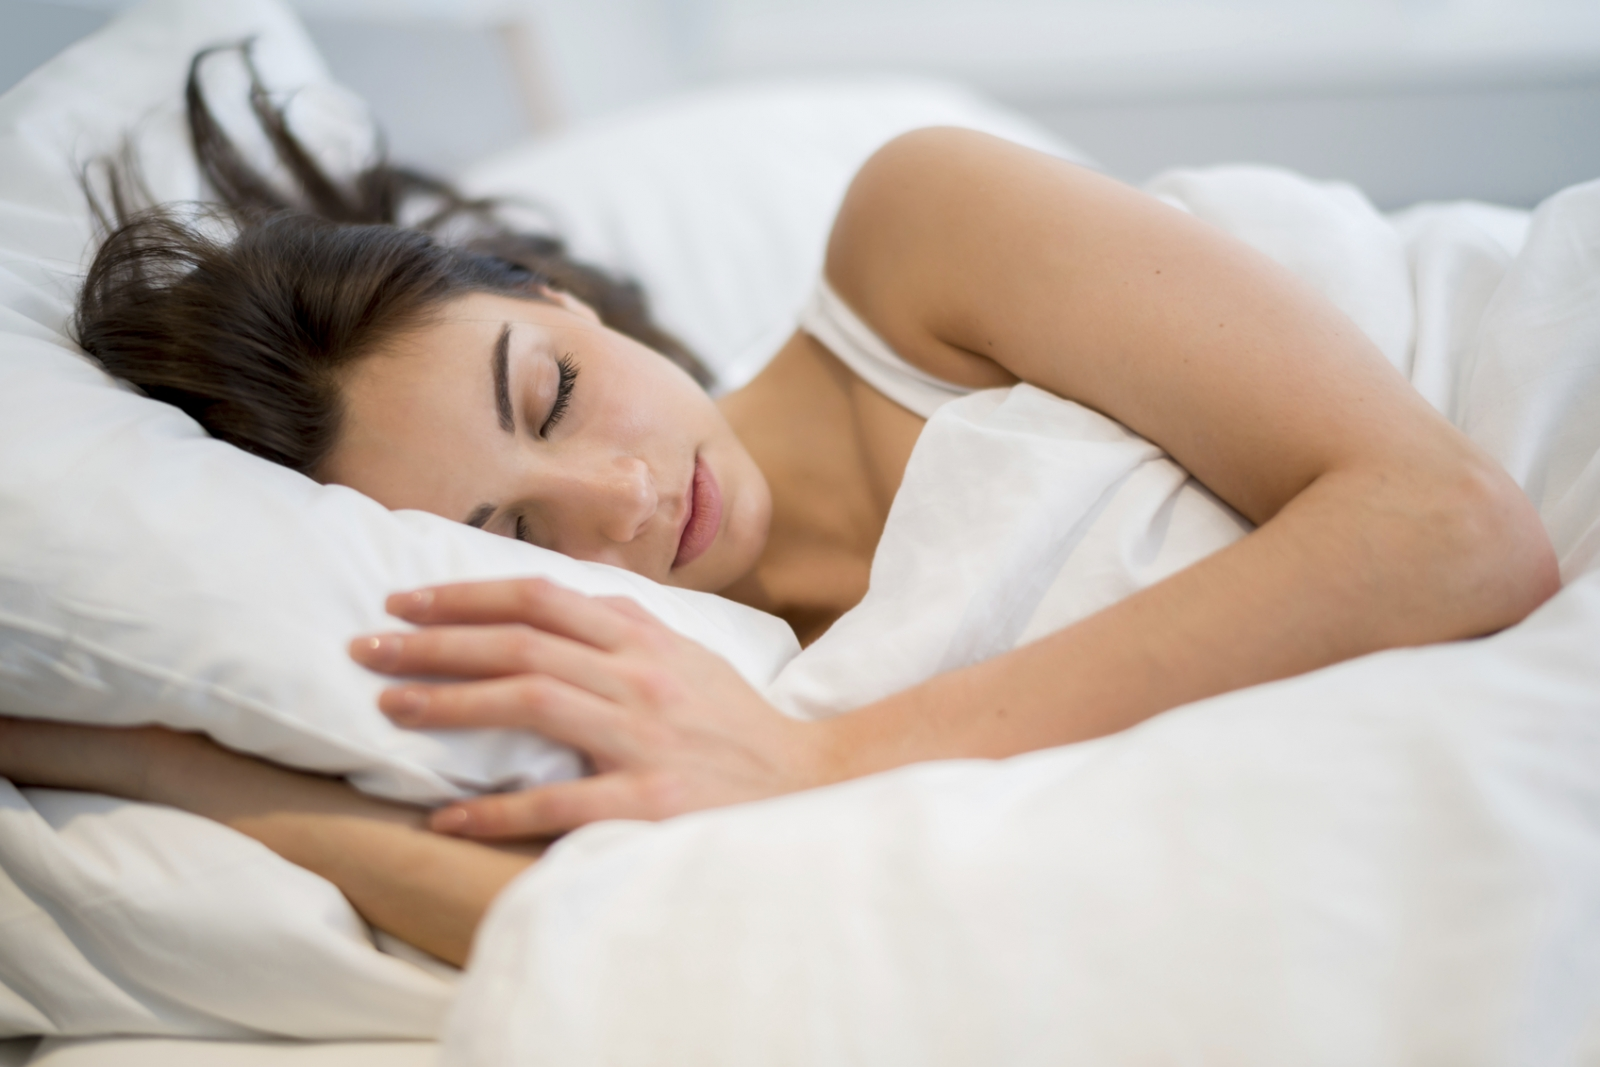 sleep dream freud theory